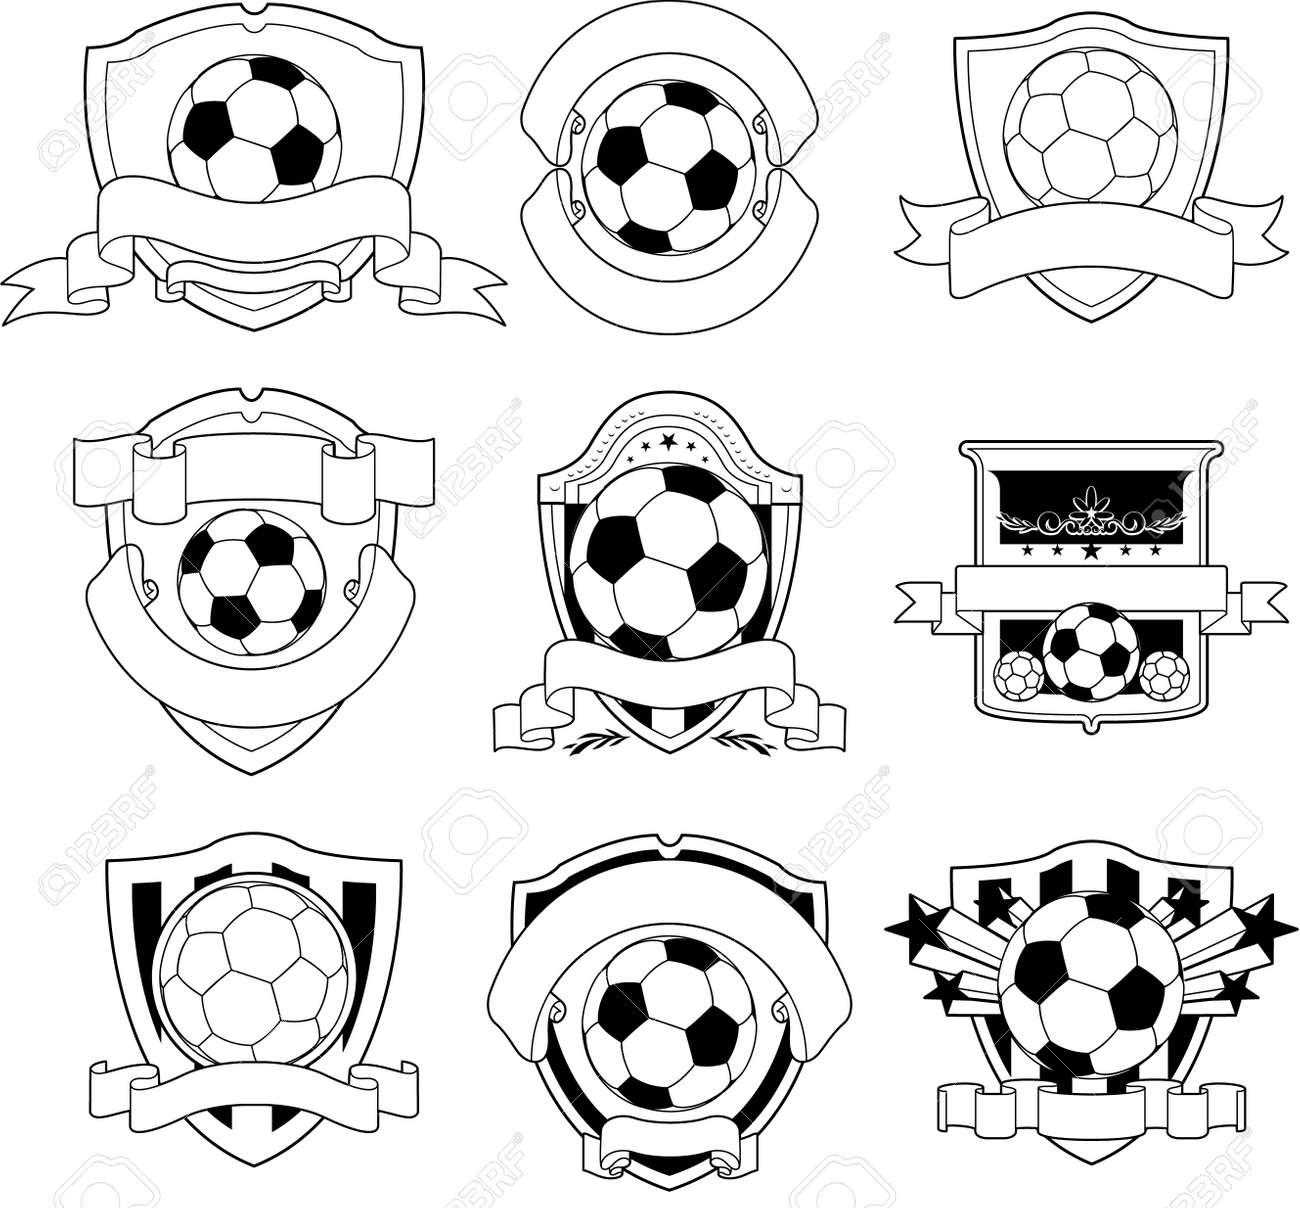 black and white soccer emblem Stock Vector - 8651640